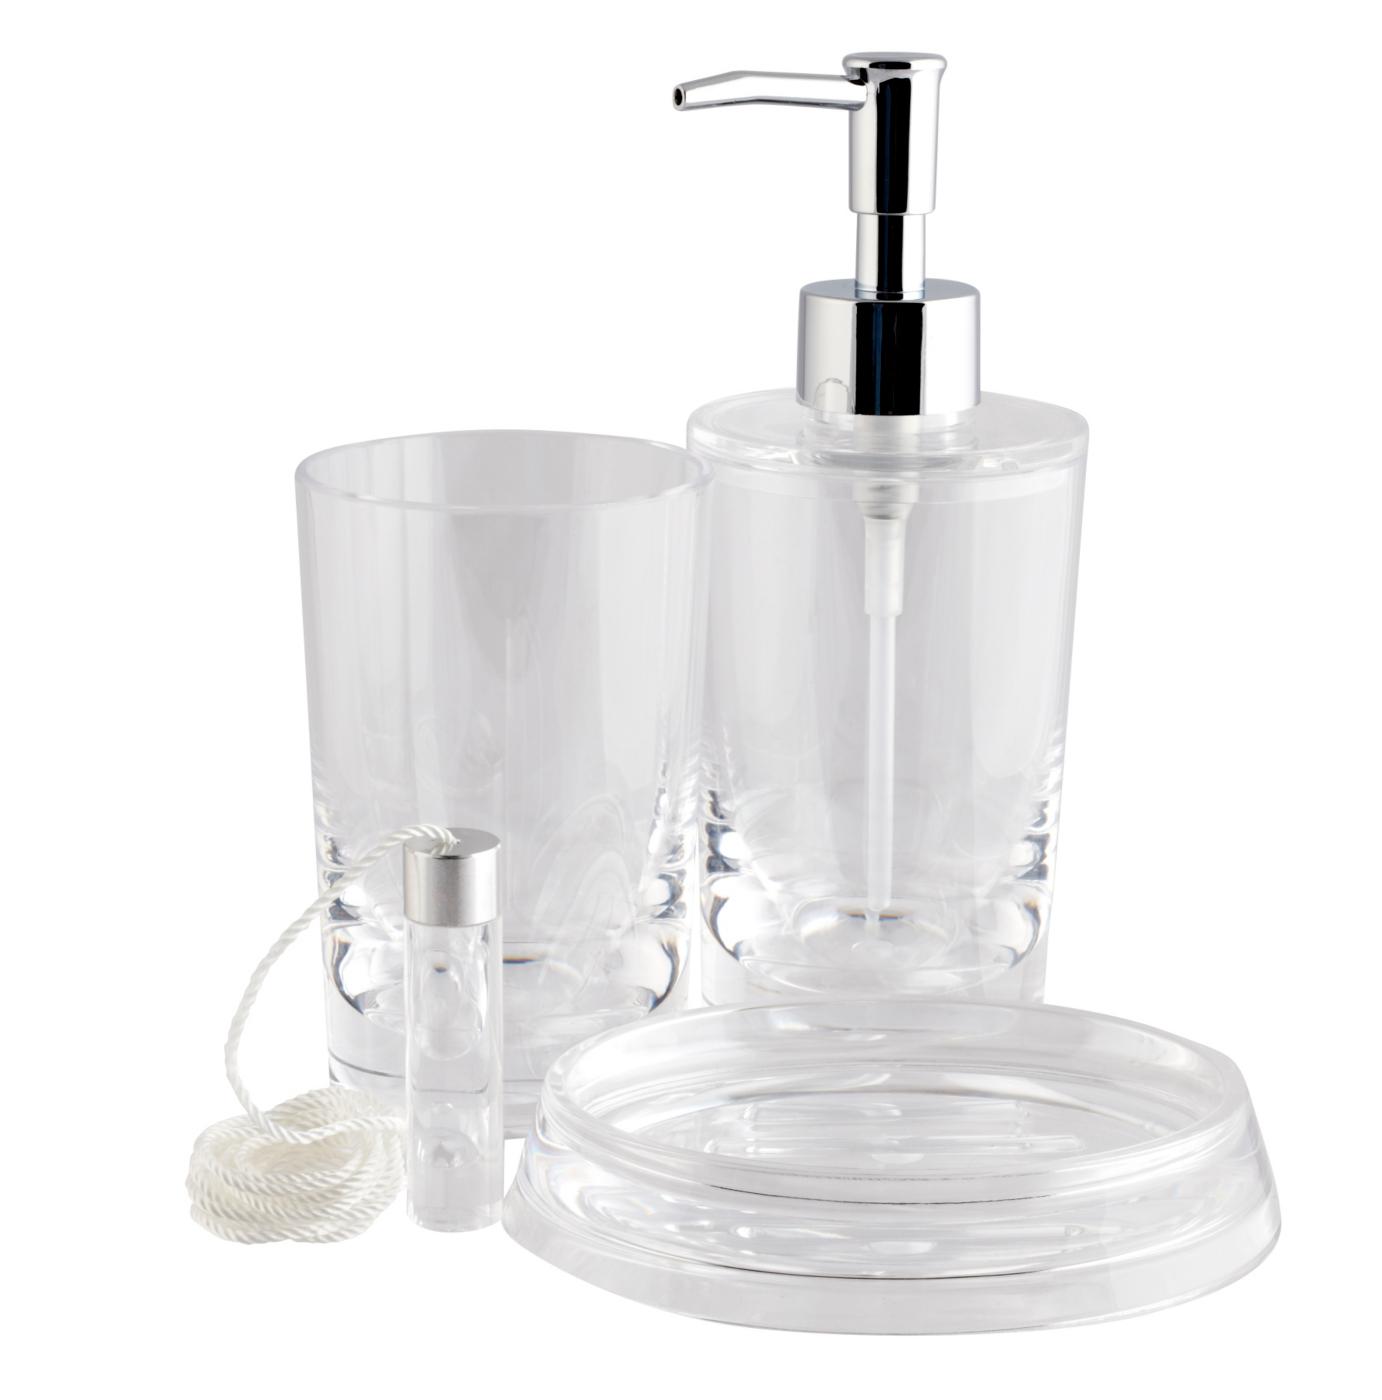 Clear Acrylic Bath Accessories Range Bathroom Accessories